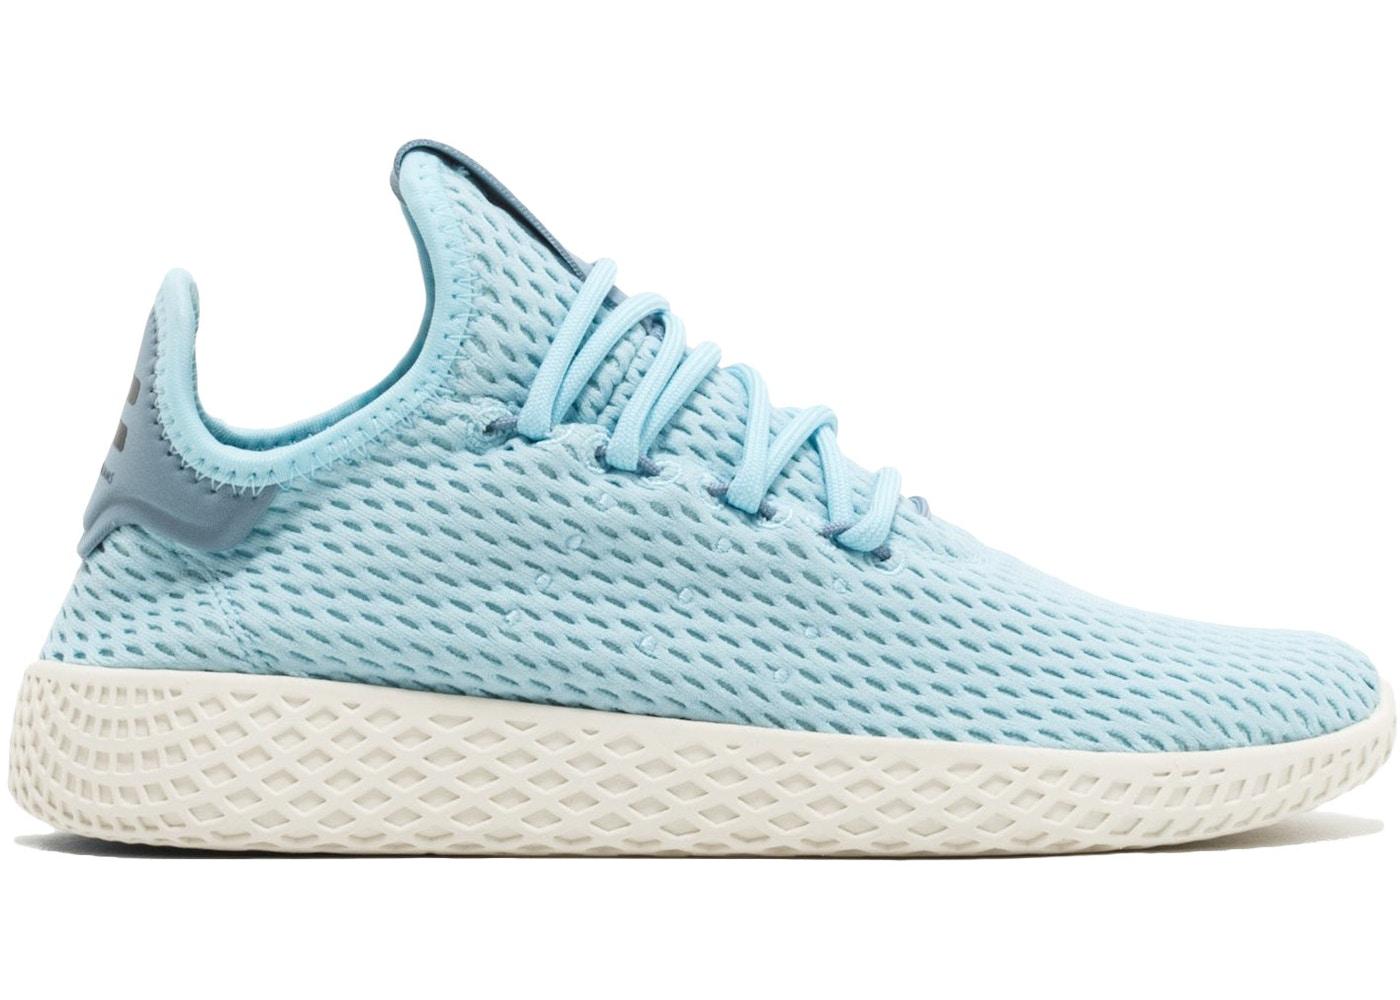 Escéptico Ganar simpático  adidas Tennis Hu x Pharrell Williams Ice Blue (Youth) - CP9802